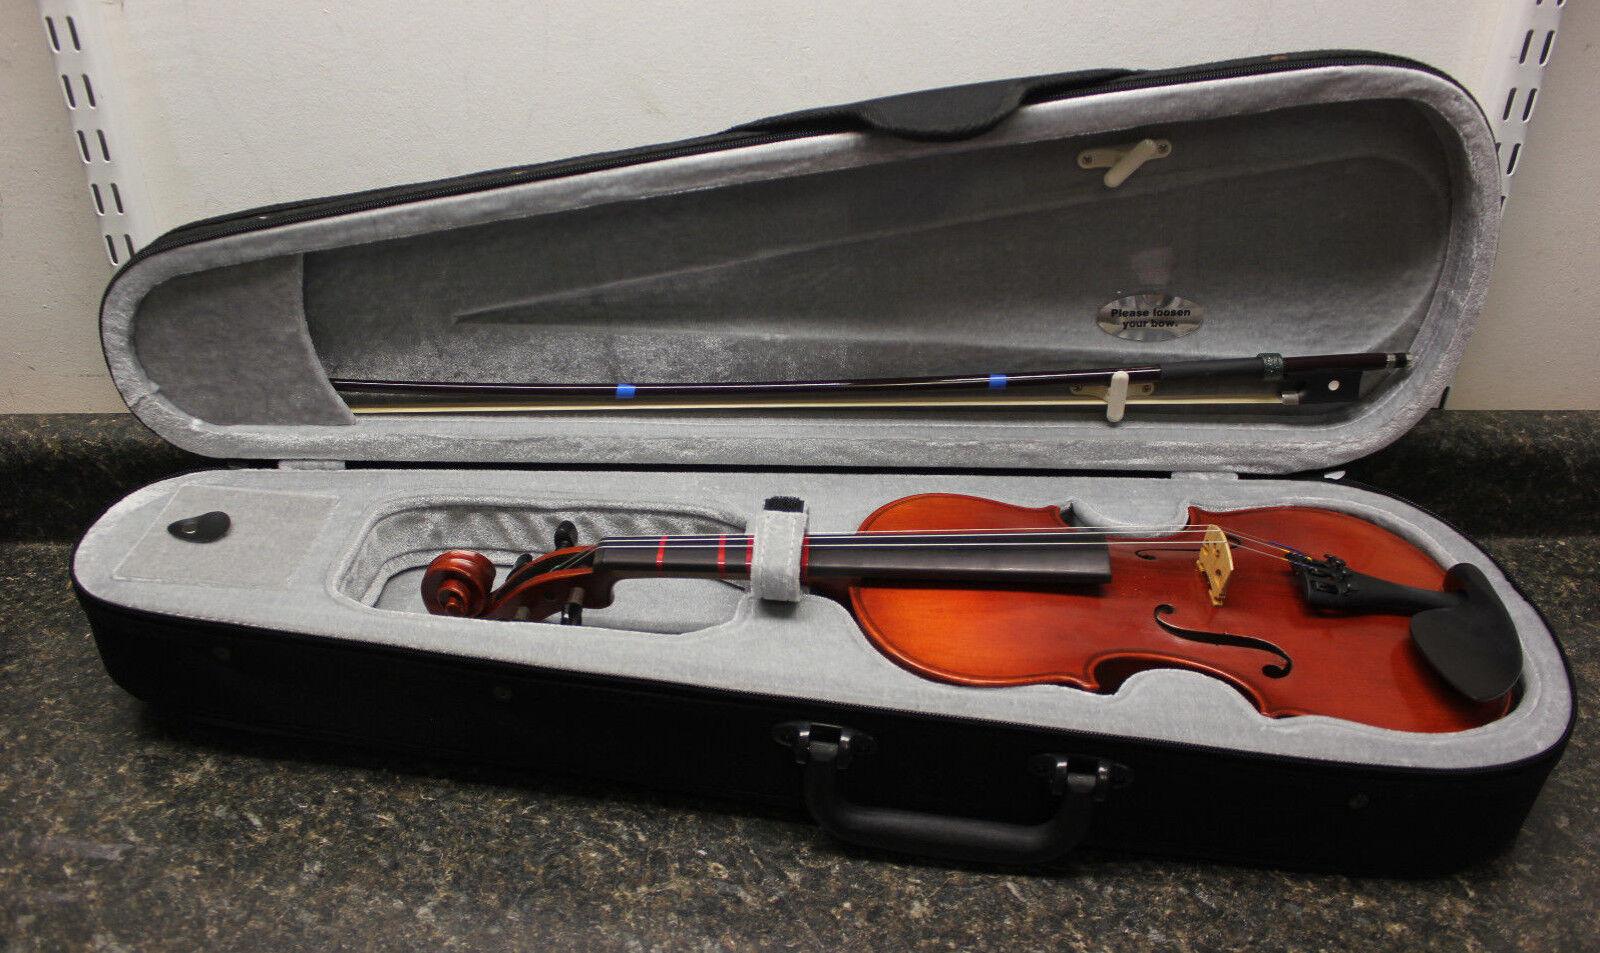 The String Project HERMANN GEIGEN 350vn34 Violin (Anno 2013, no.6965) 99937-1 F3